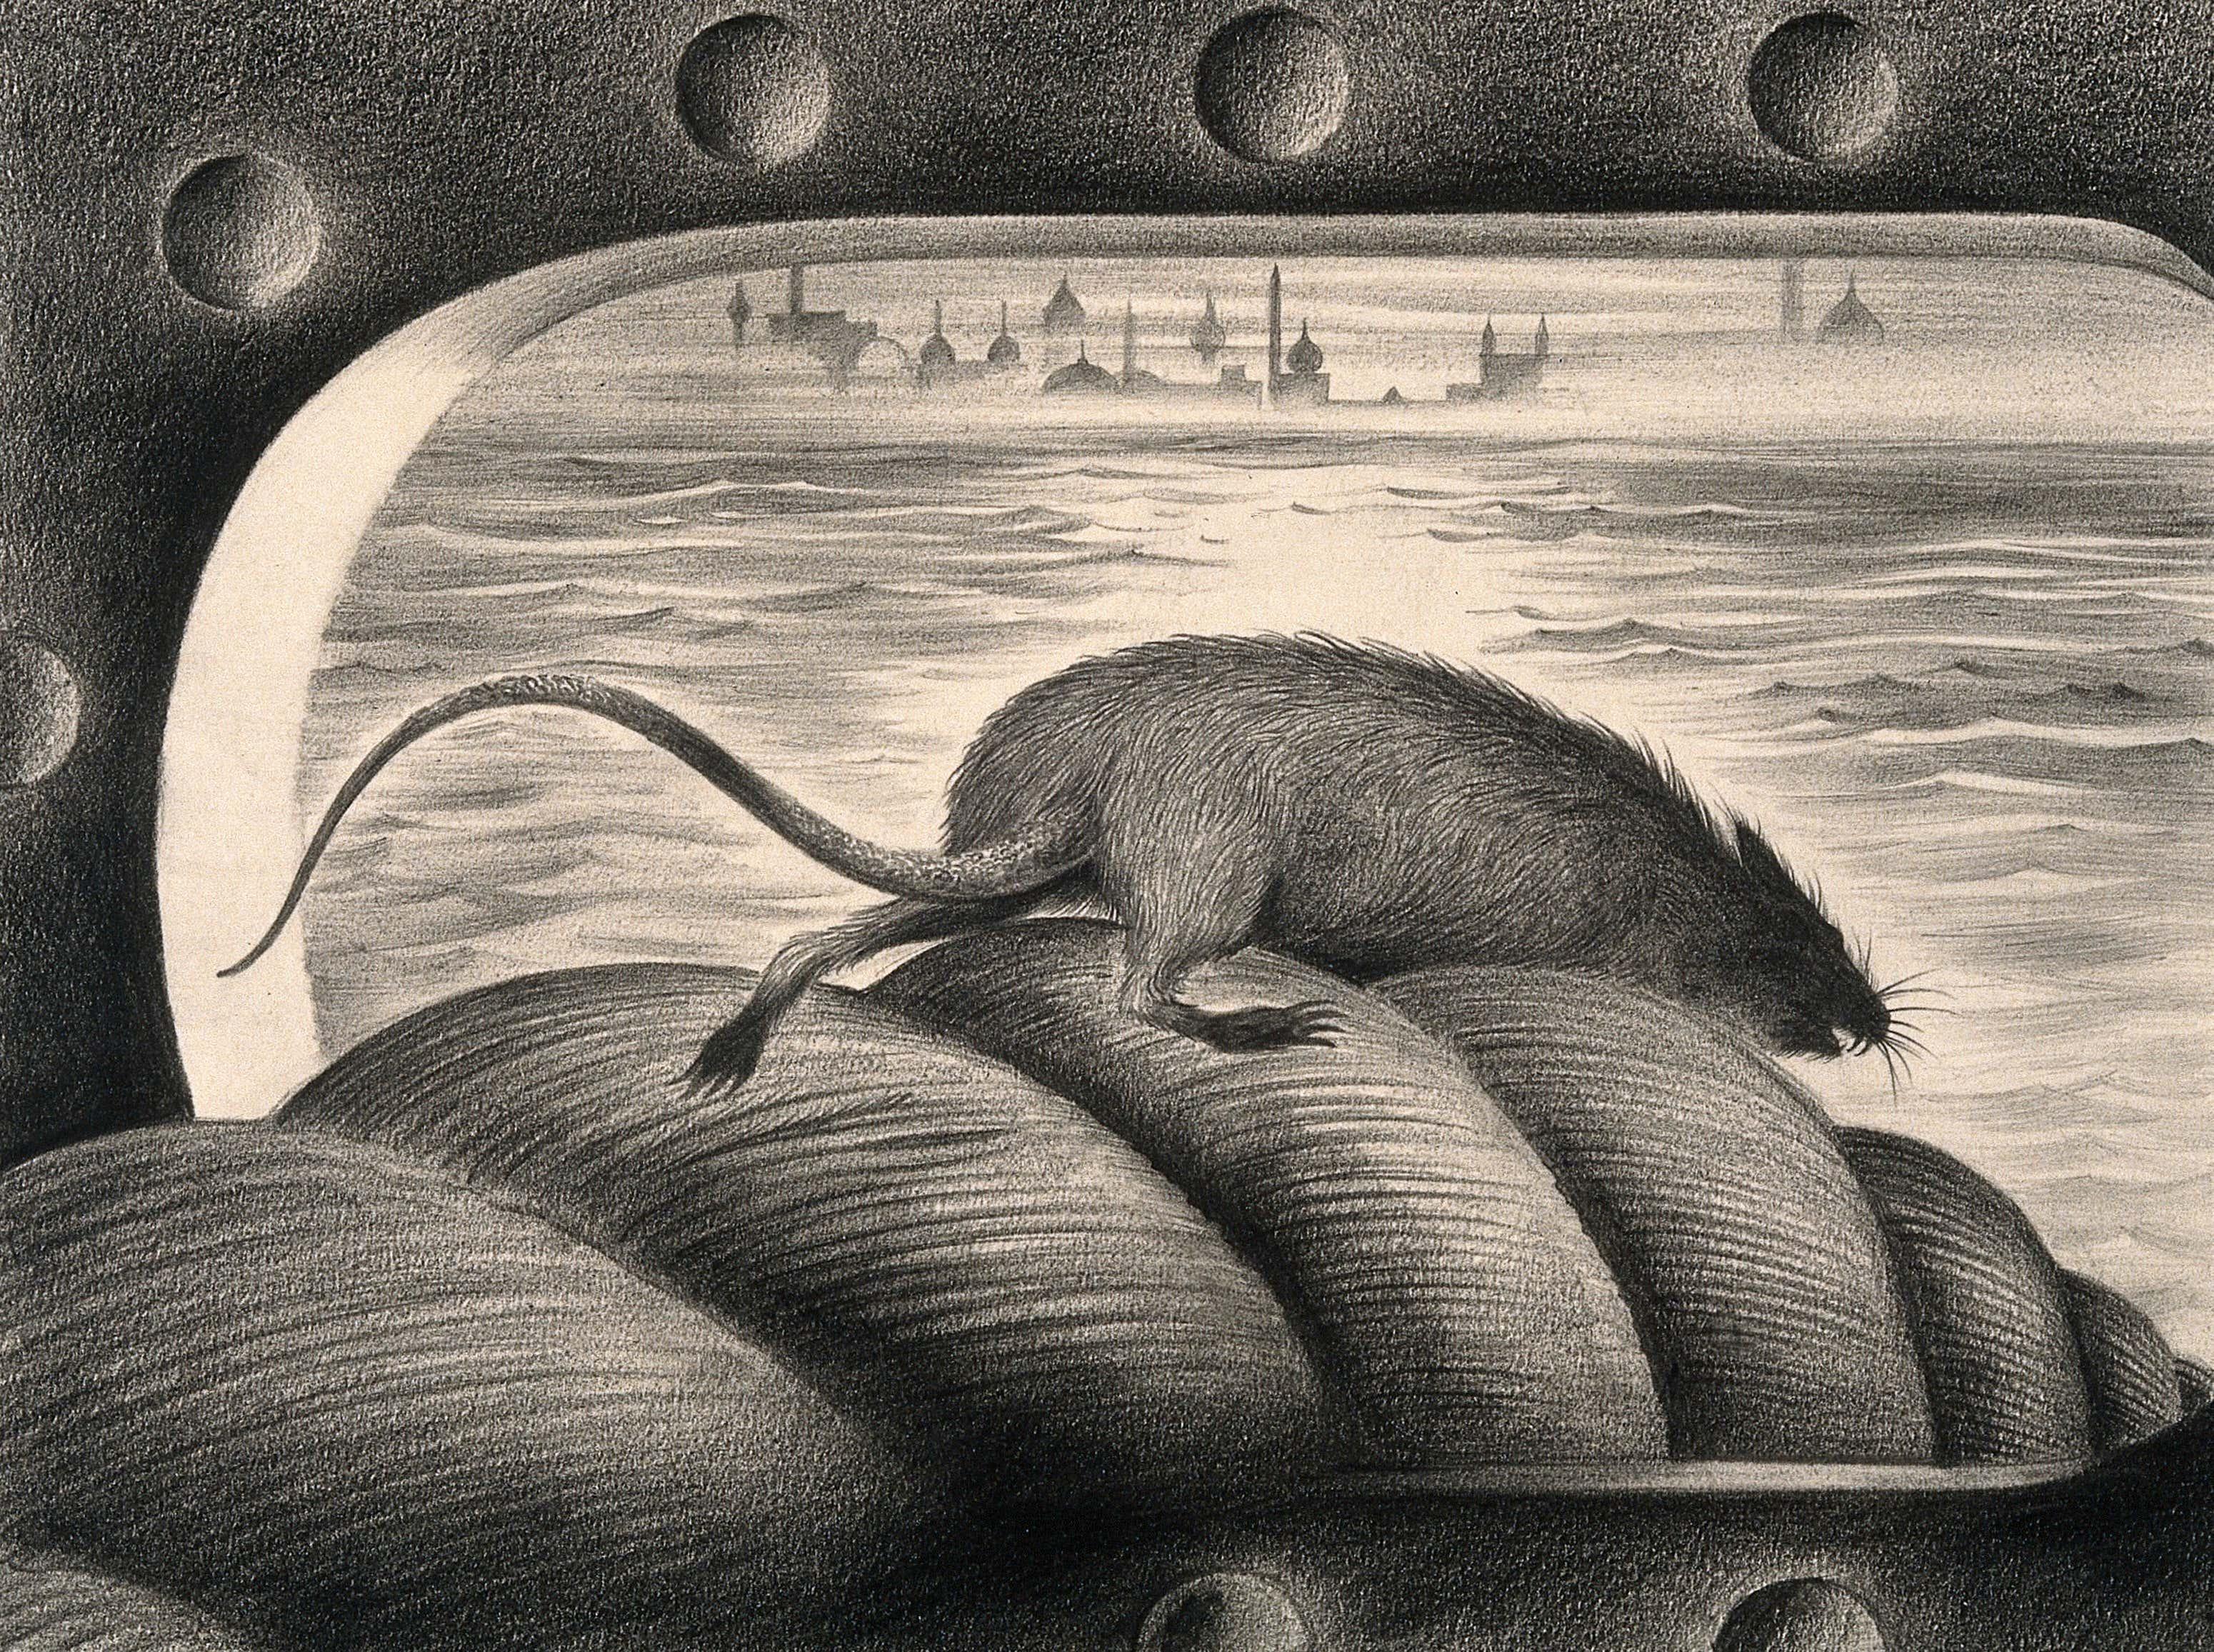 A_rat_leaving_a_ship_via_the_mooring_rope,_thus_spreading_th_Wellcome_V0010685.jpg